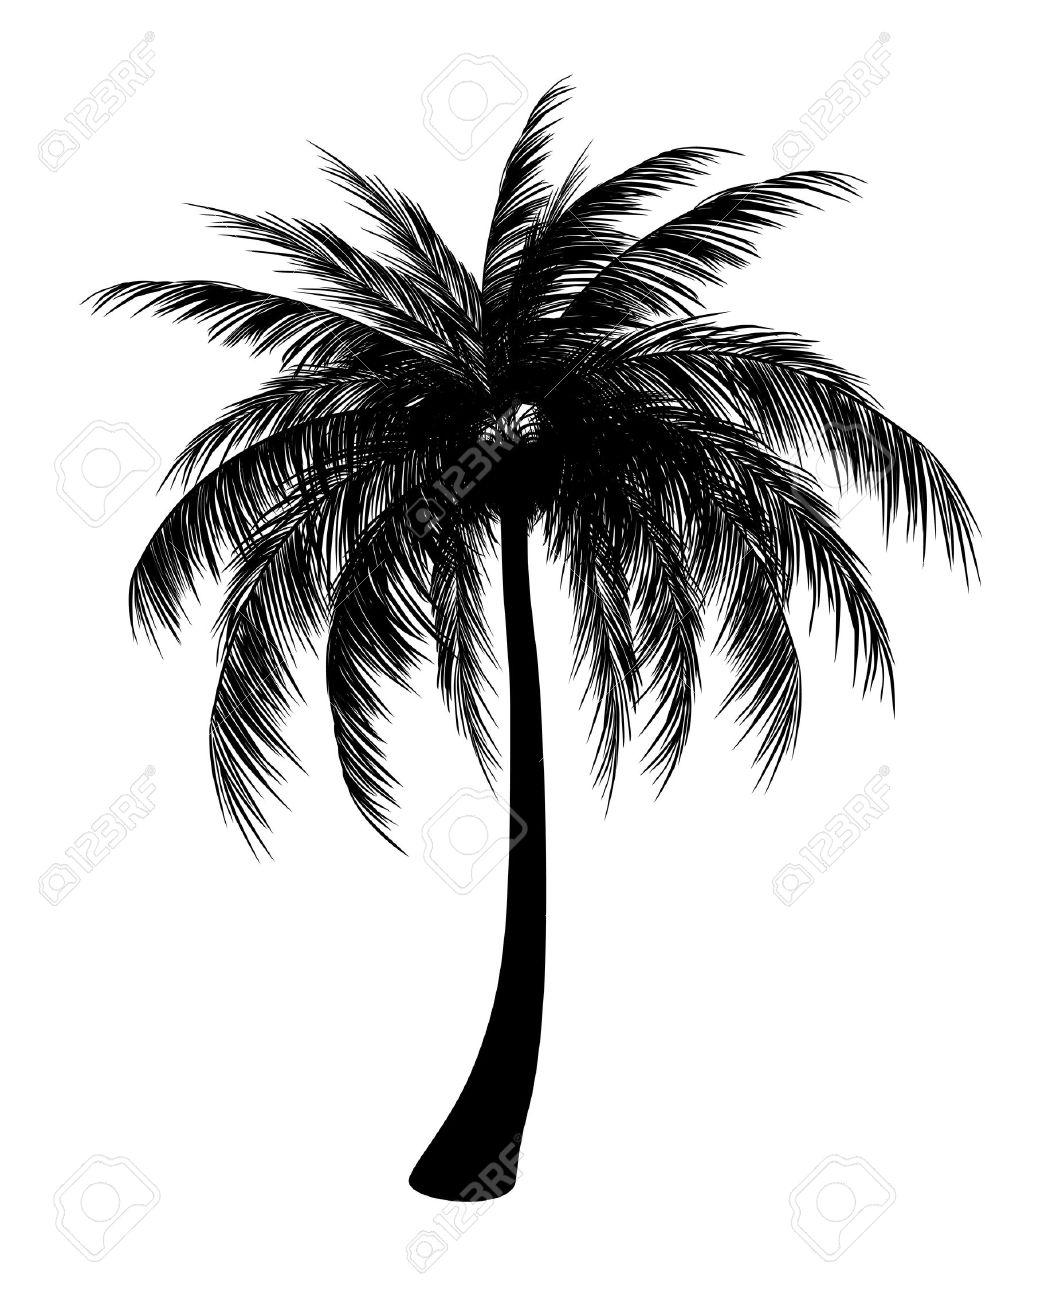 Silhouette of single palm - 28517077